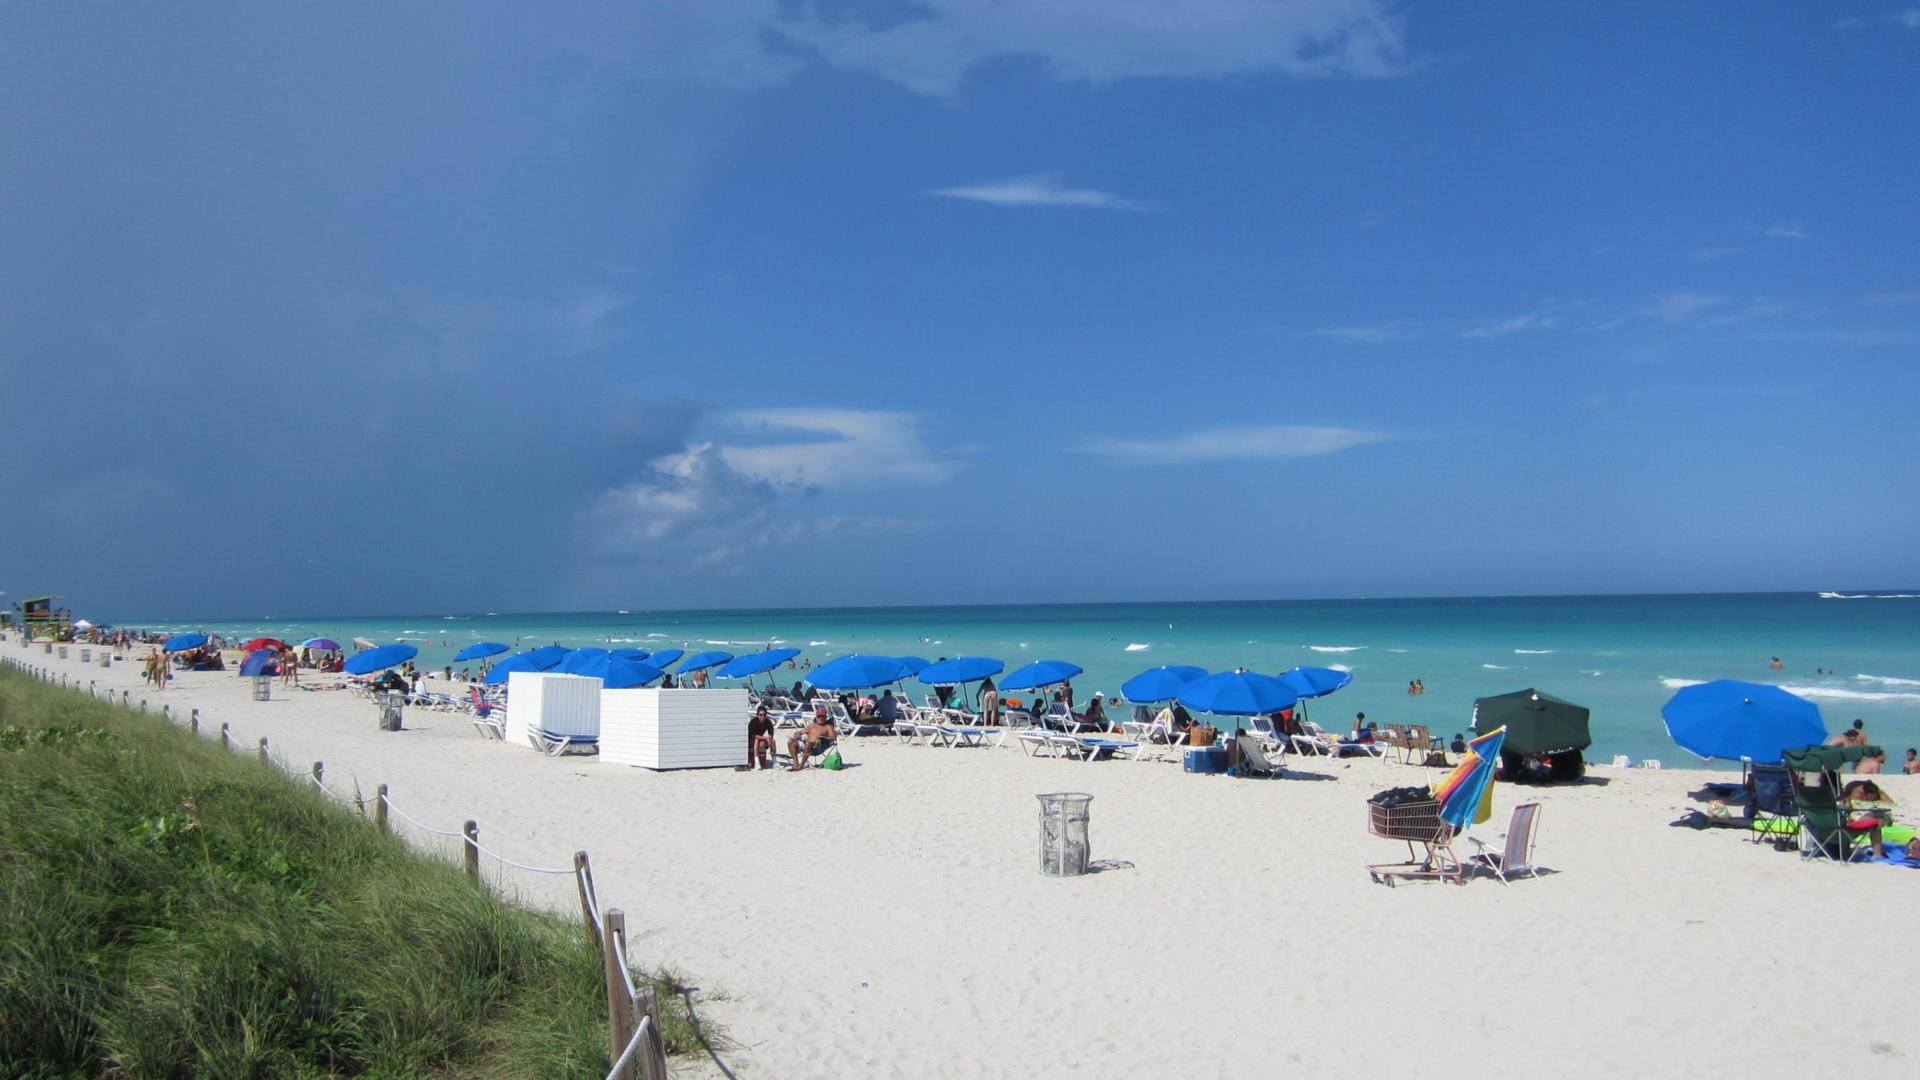 South Beach Miami Florida HD Wallpaper of Beach   hdwallpaper2013com 1920x1080